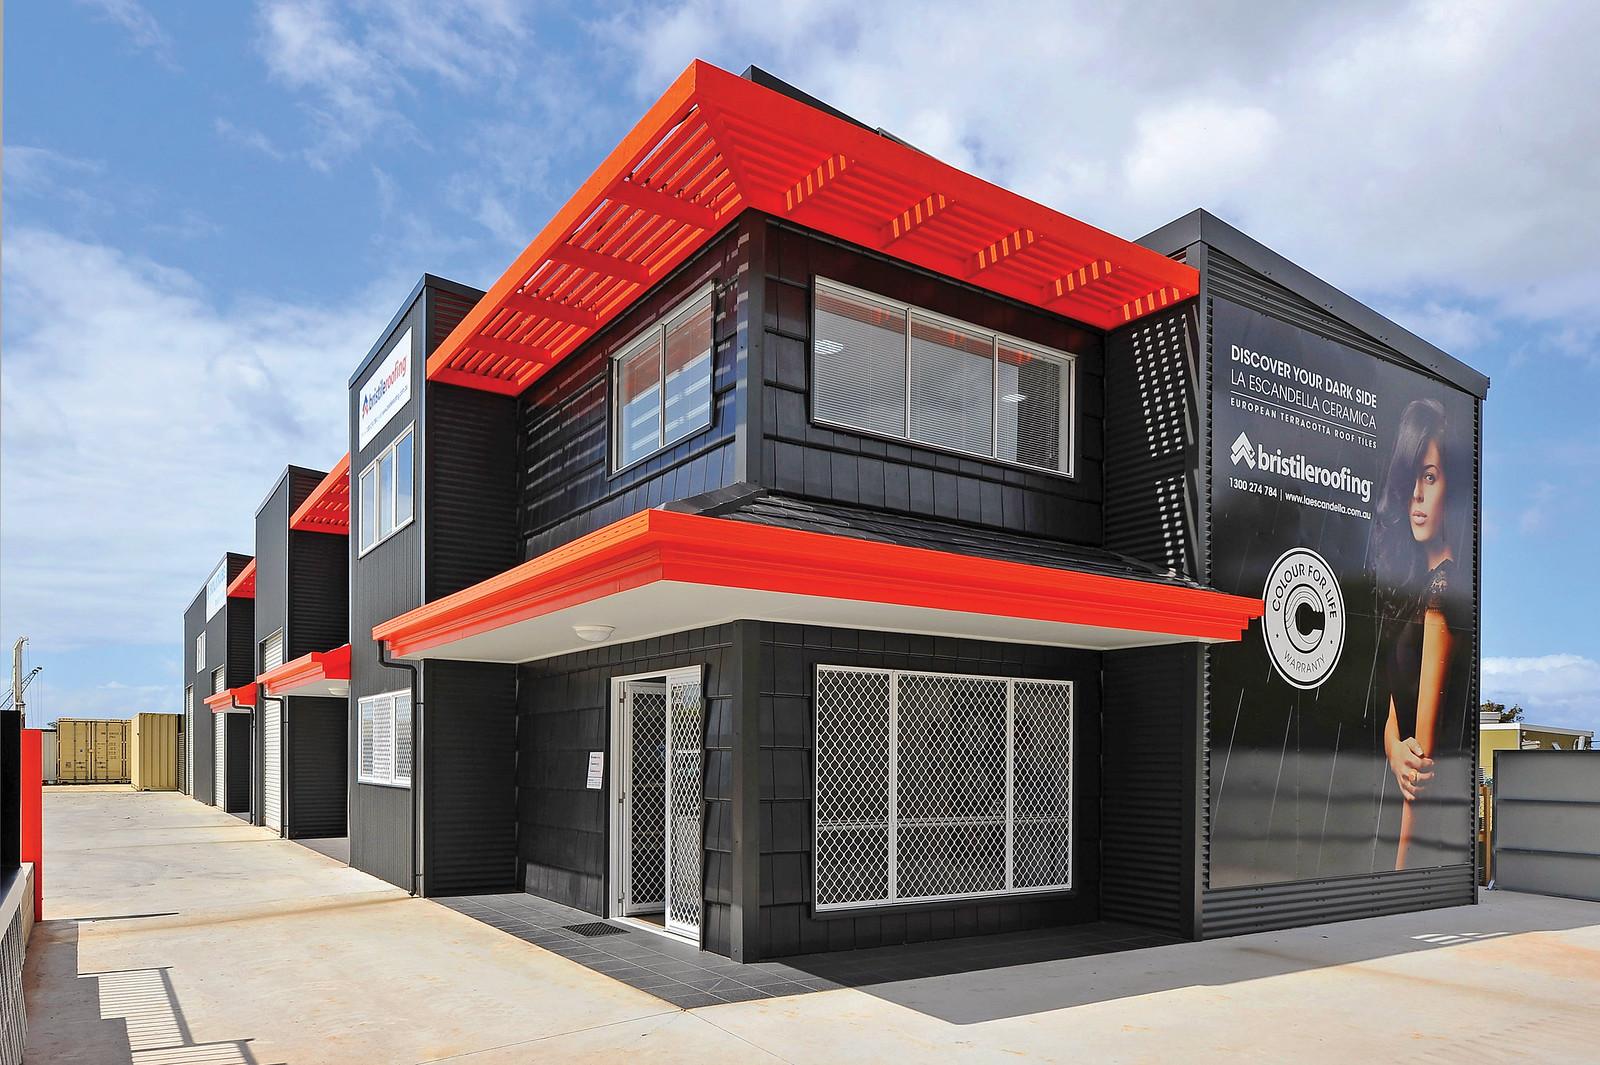 Bristile Roofing Port Macquarie Design Centre